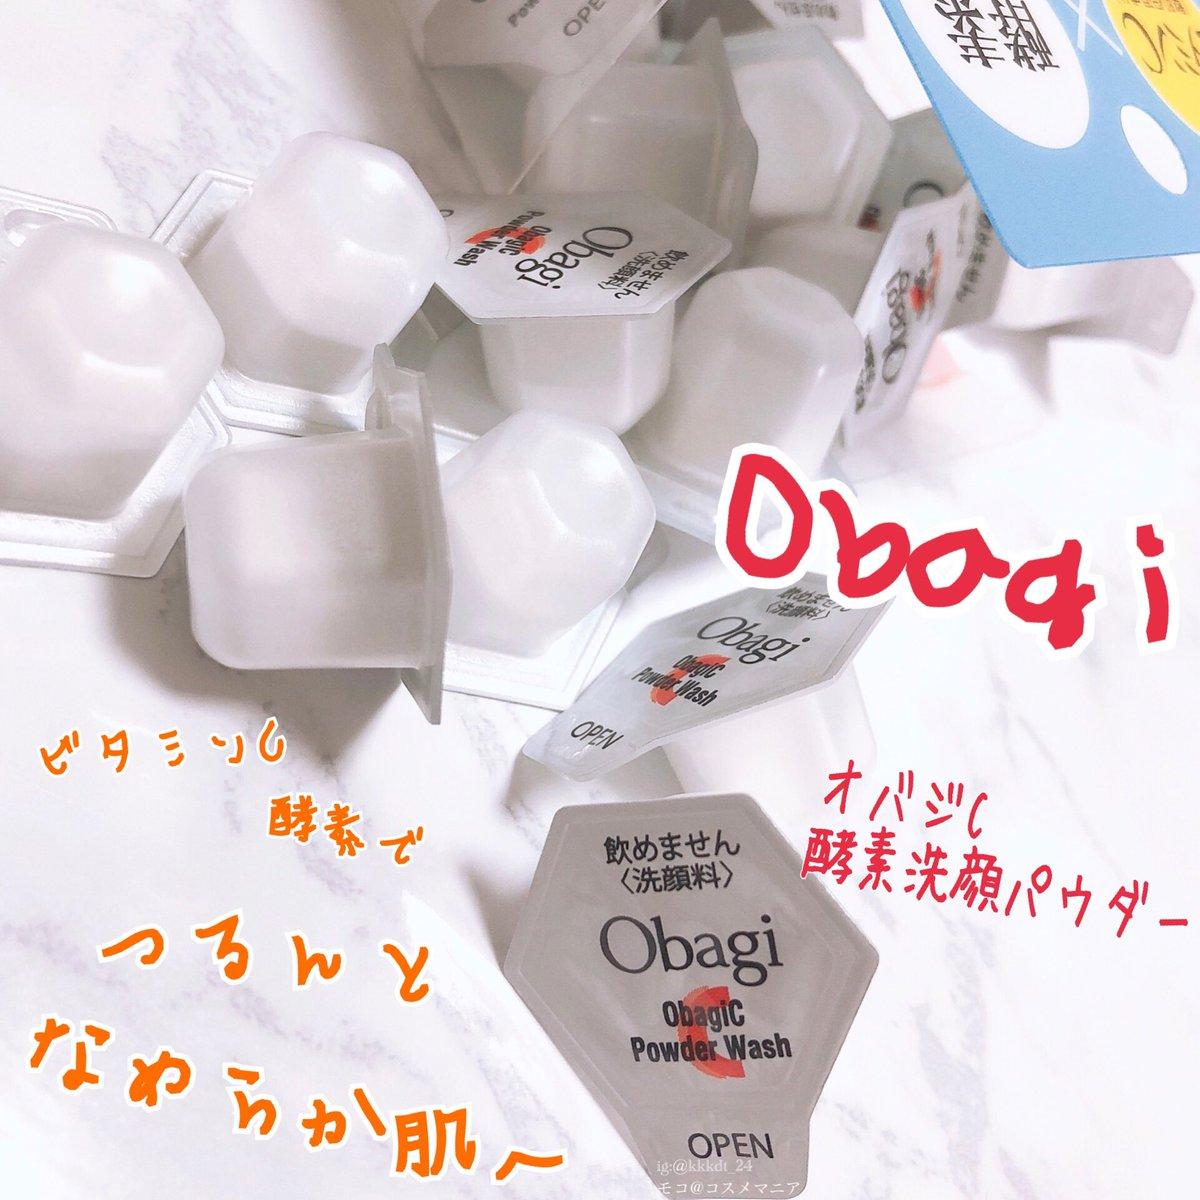 C パウダー オバジ 酵素 洗顔